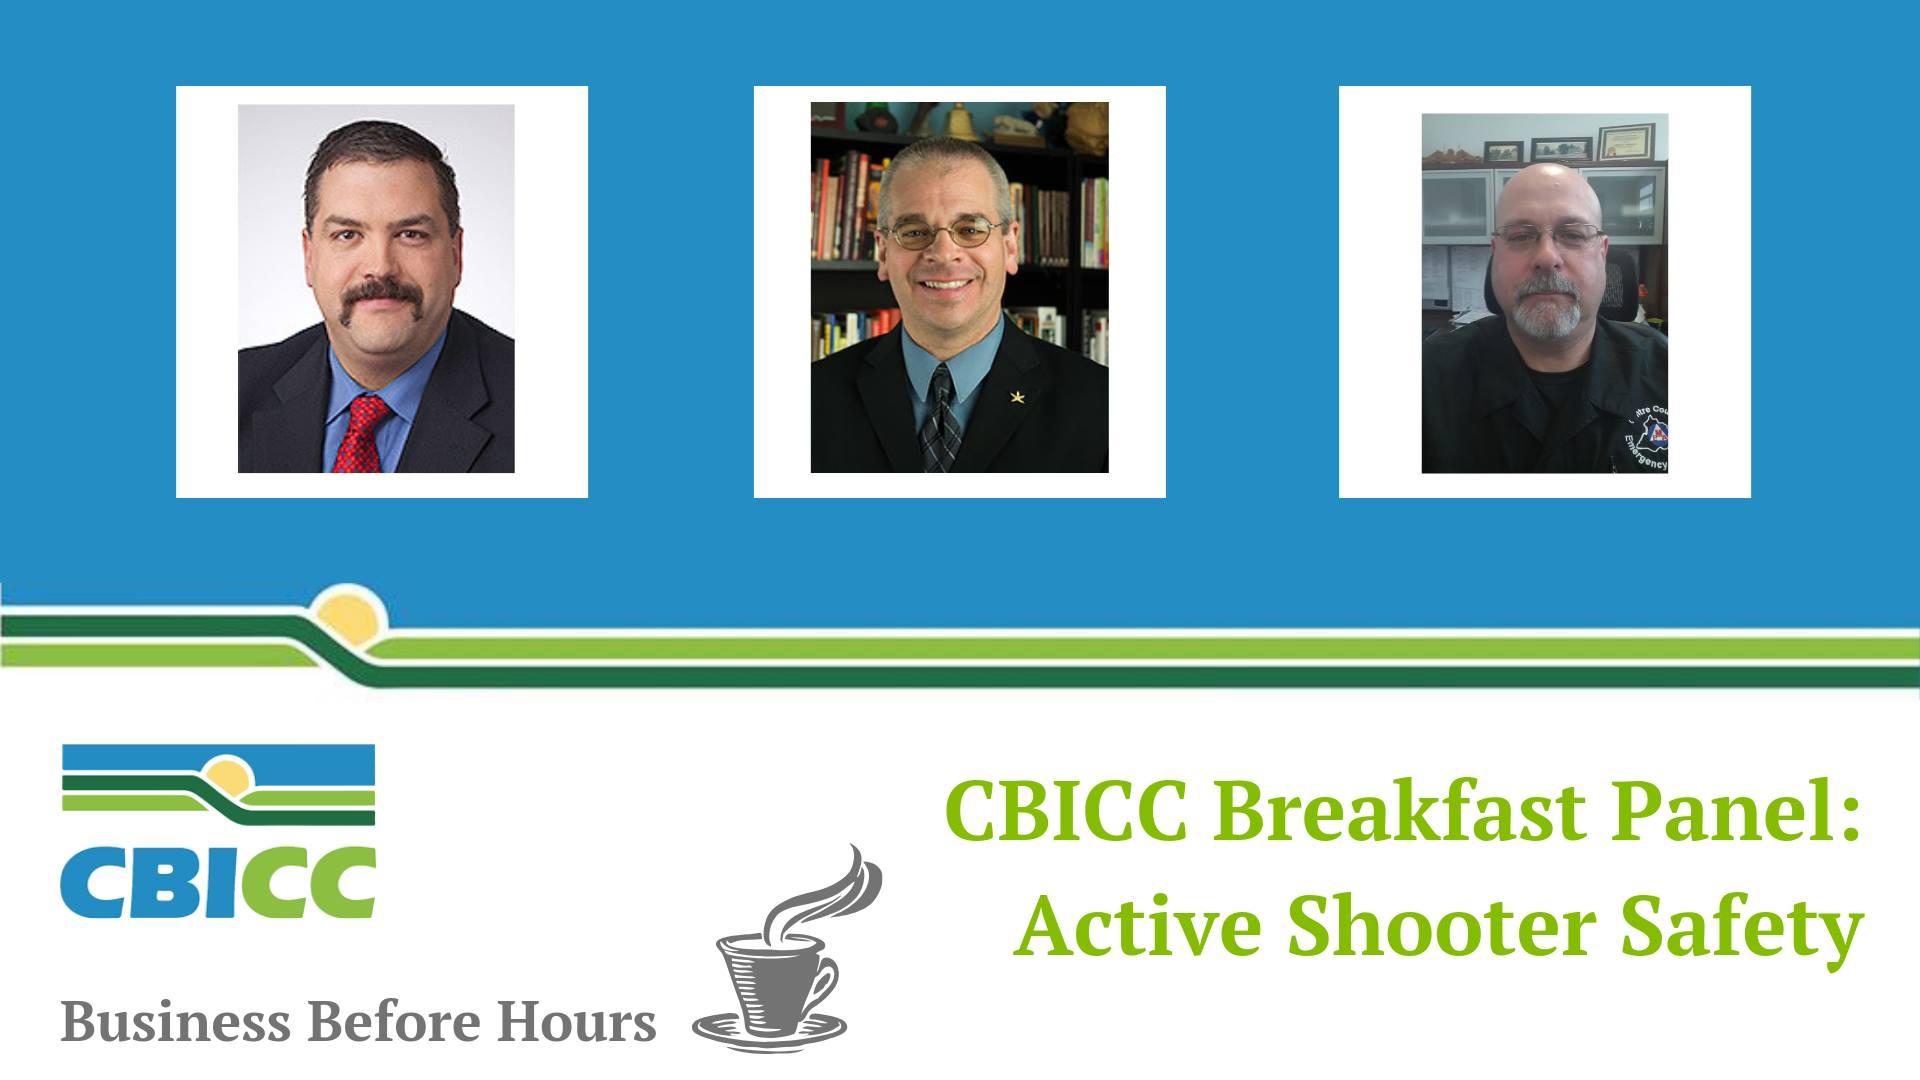 CBICC BREAKFAST PANEL ACTIVE SHOOTER SAFETY_1556487781089.jpg.jpg